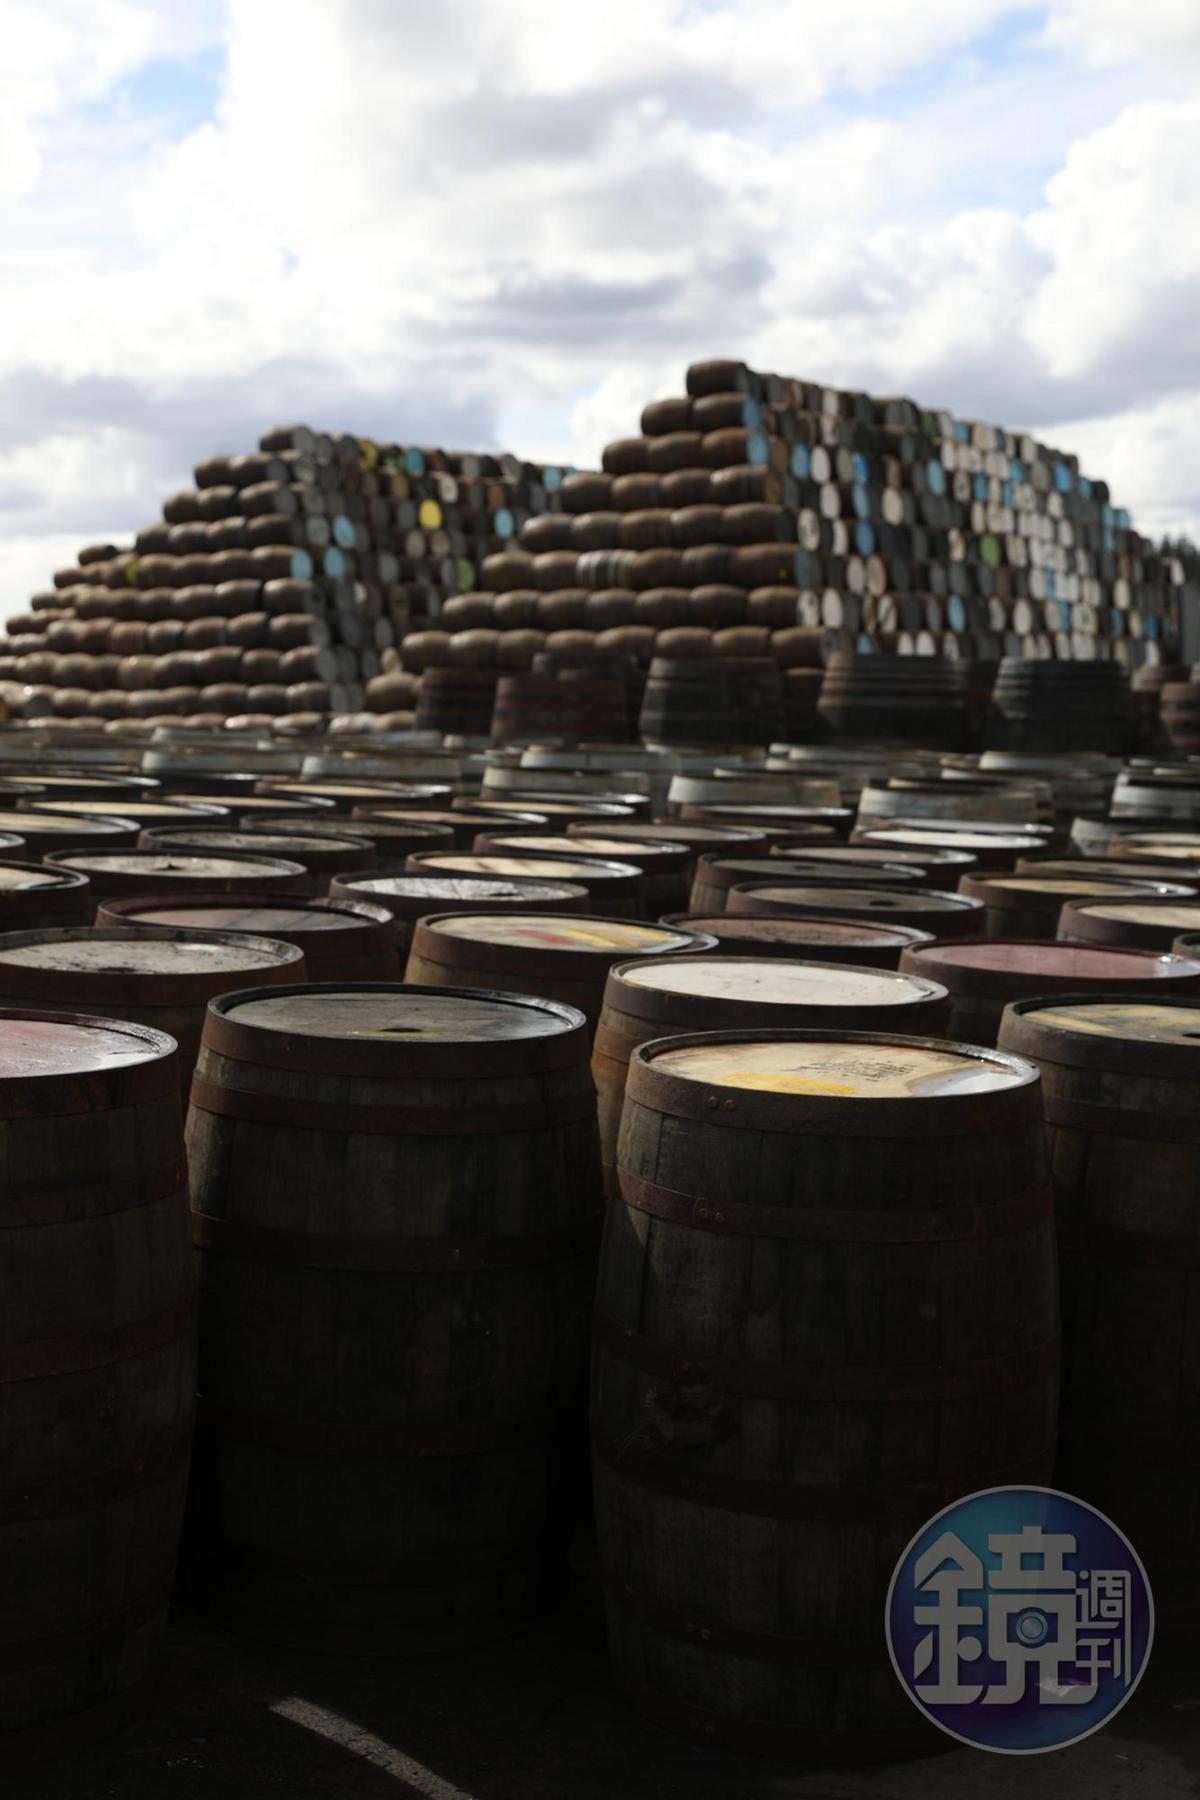 「Speyside Cooperage」是英國最大的製桶廠,成千上萬的橡木桶正等著通過檢驗,出貨到世界各地。